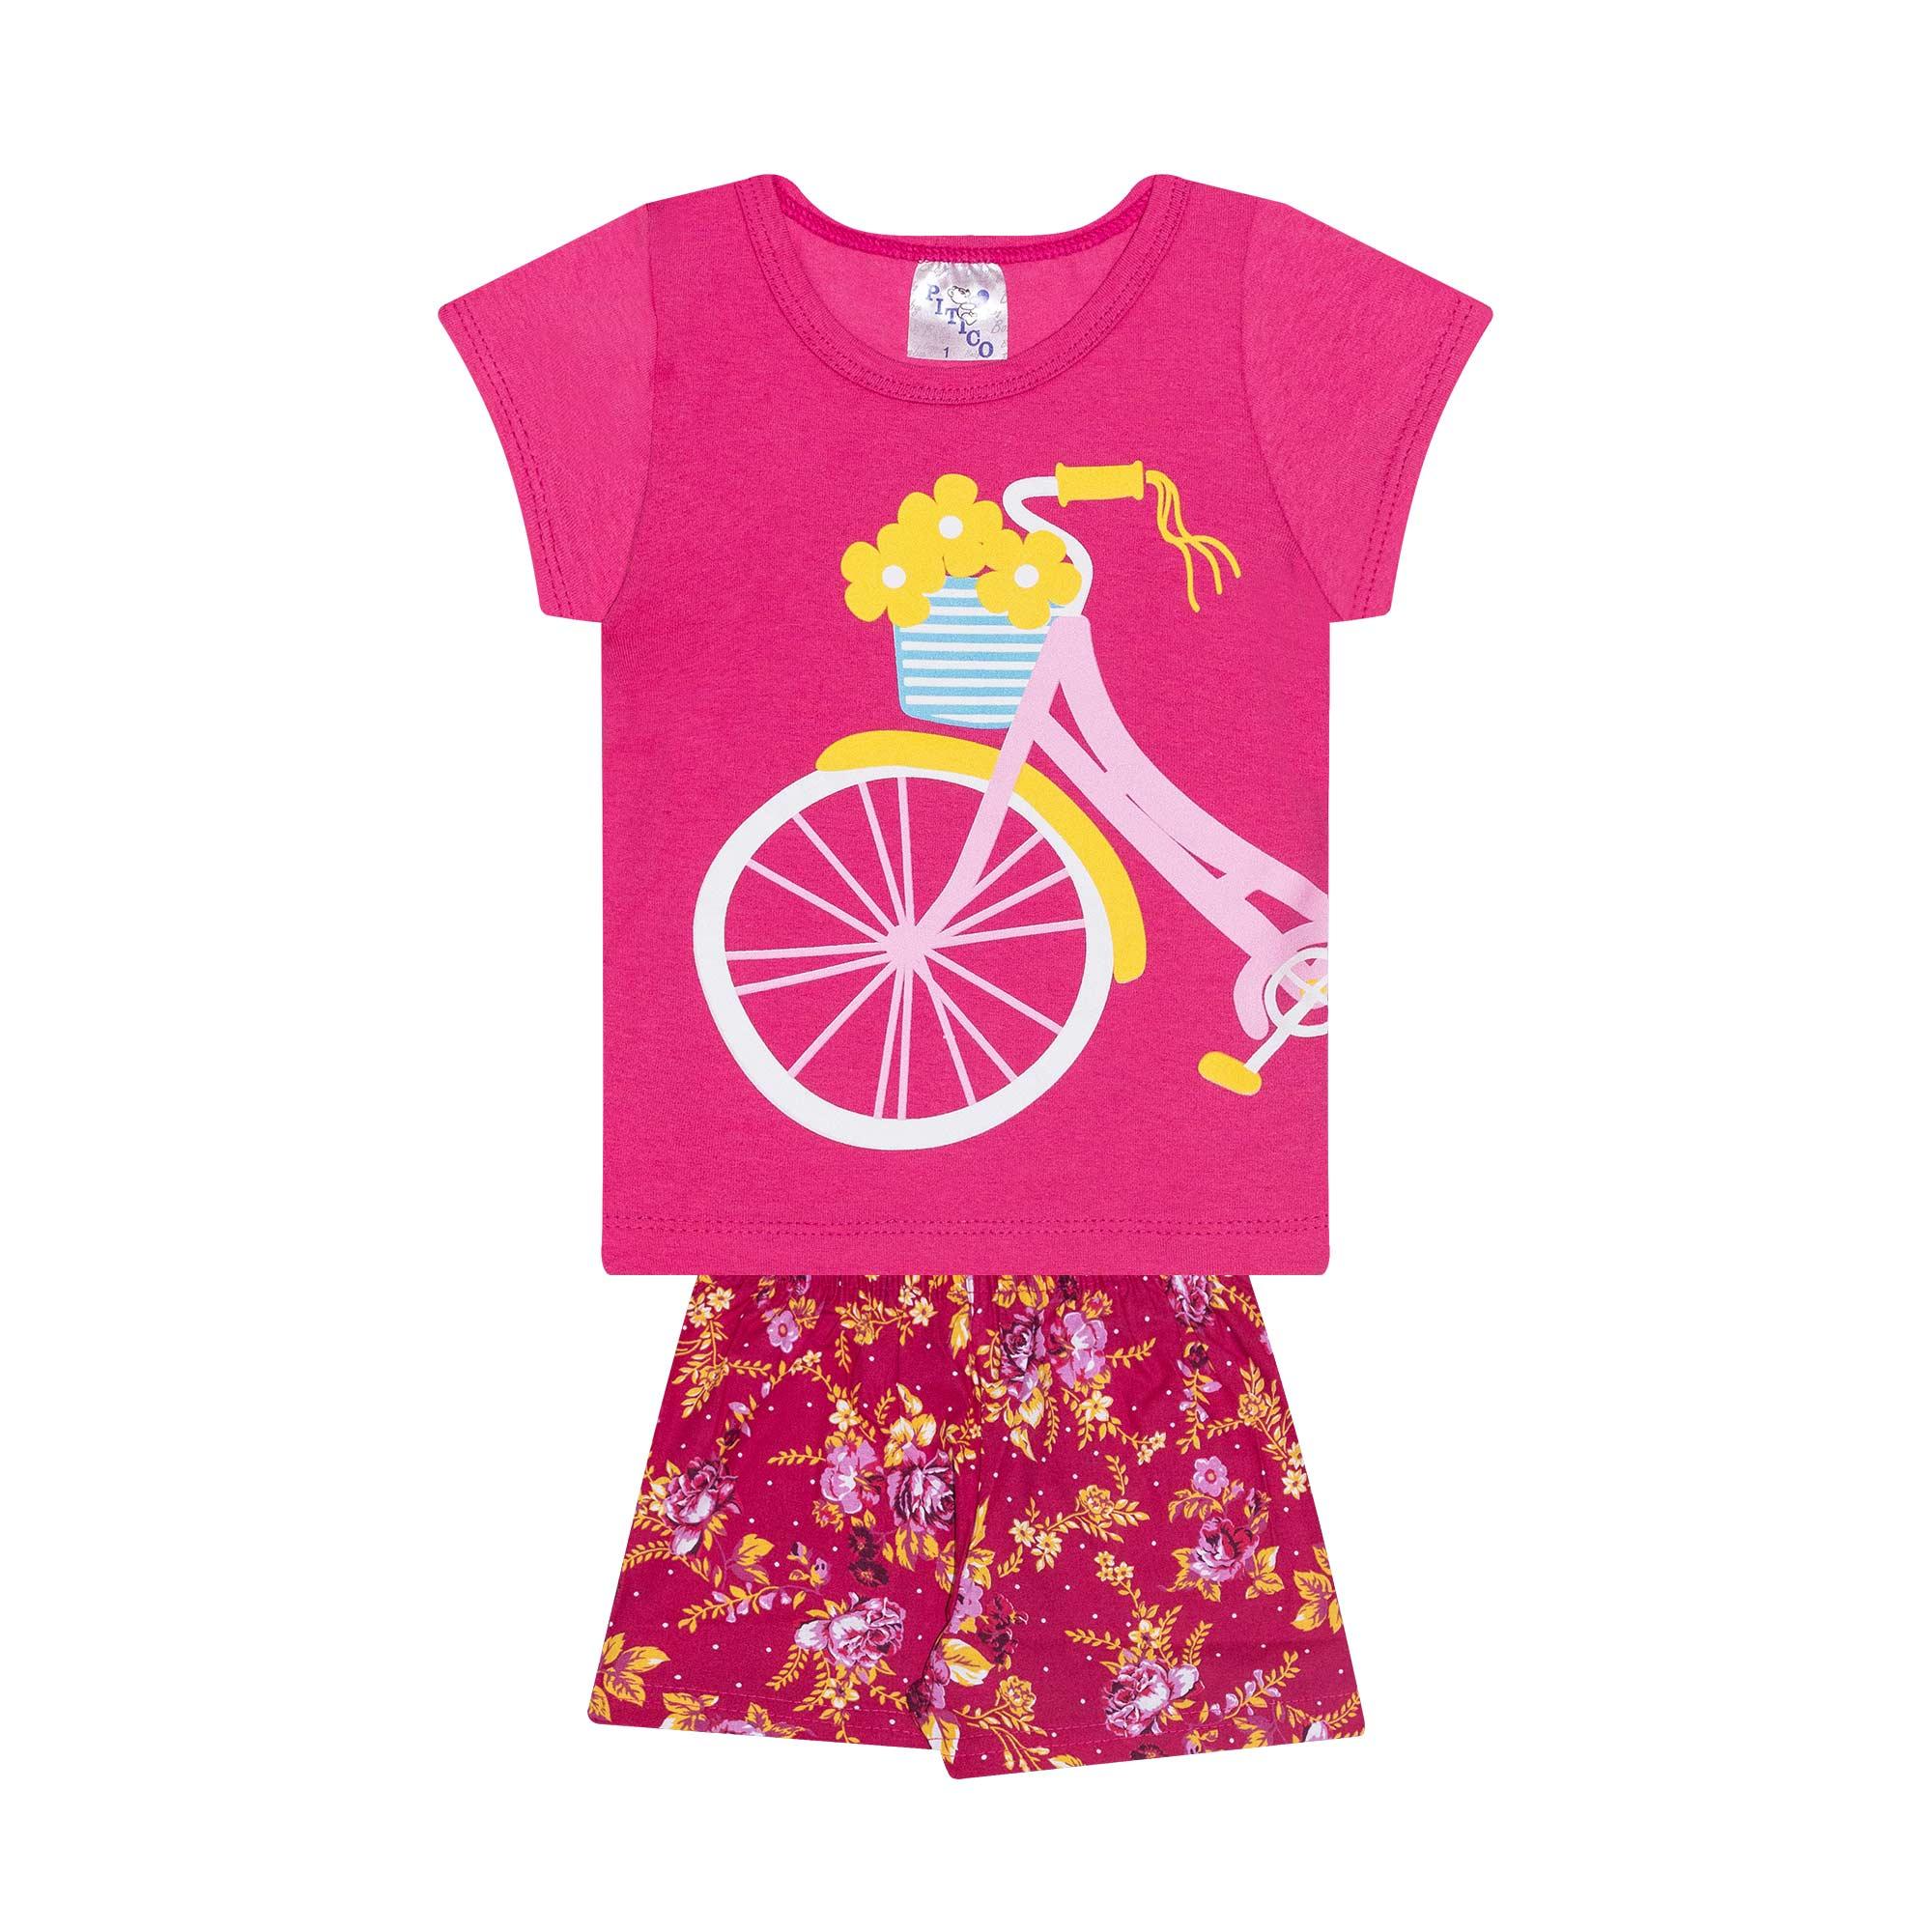 Conjunto Infantil Feminino - Ref 1019 - Rosa/Pink - Pitico